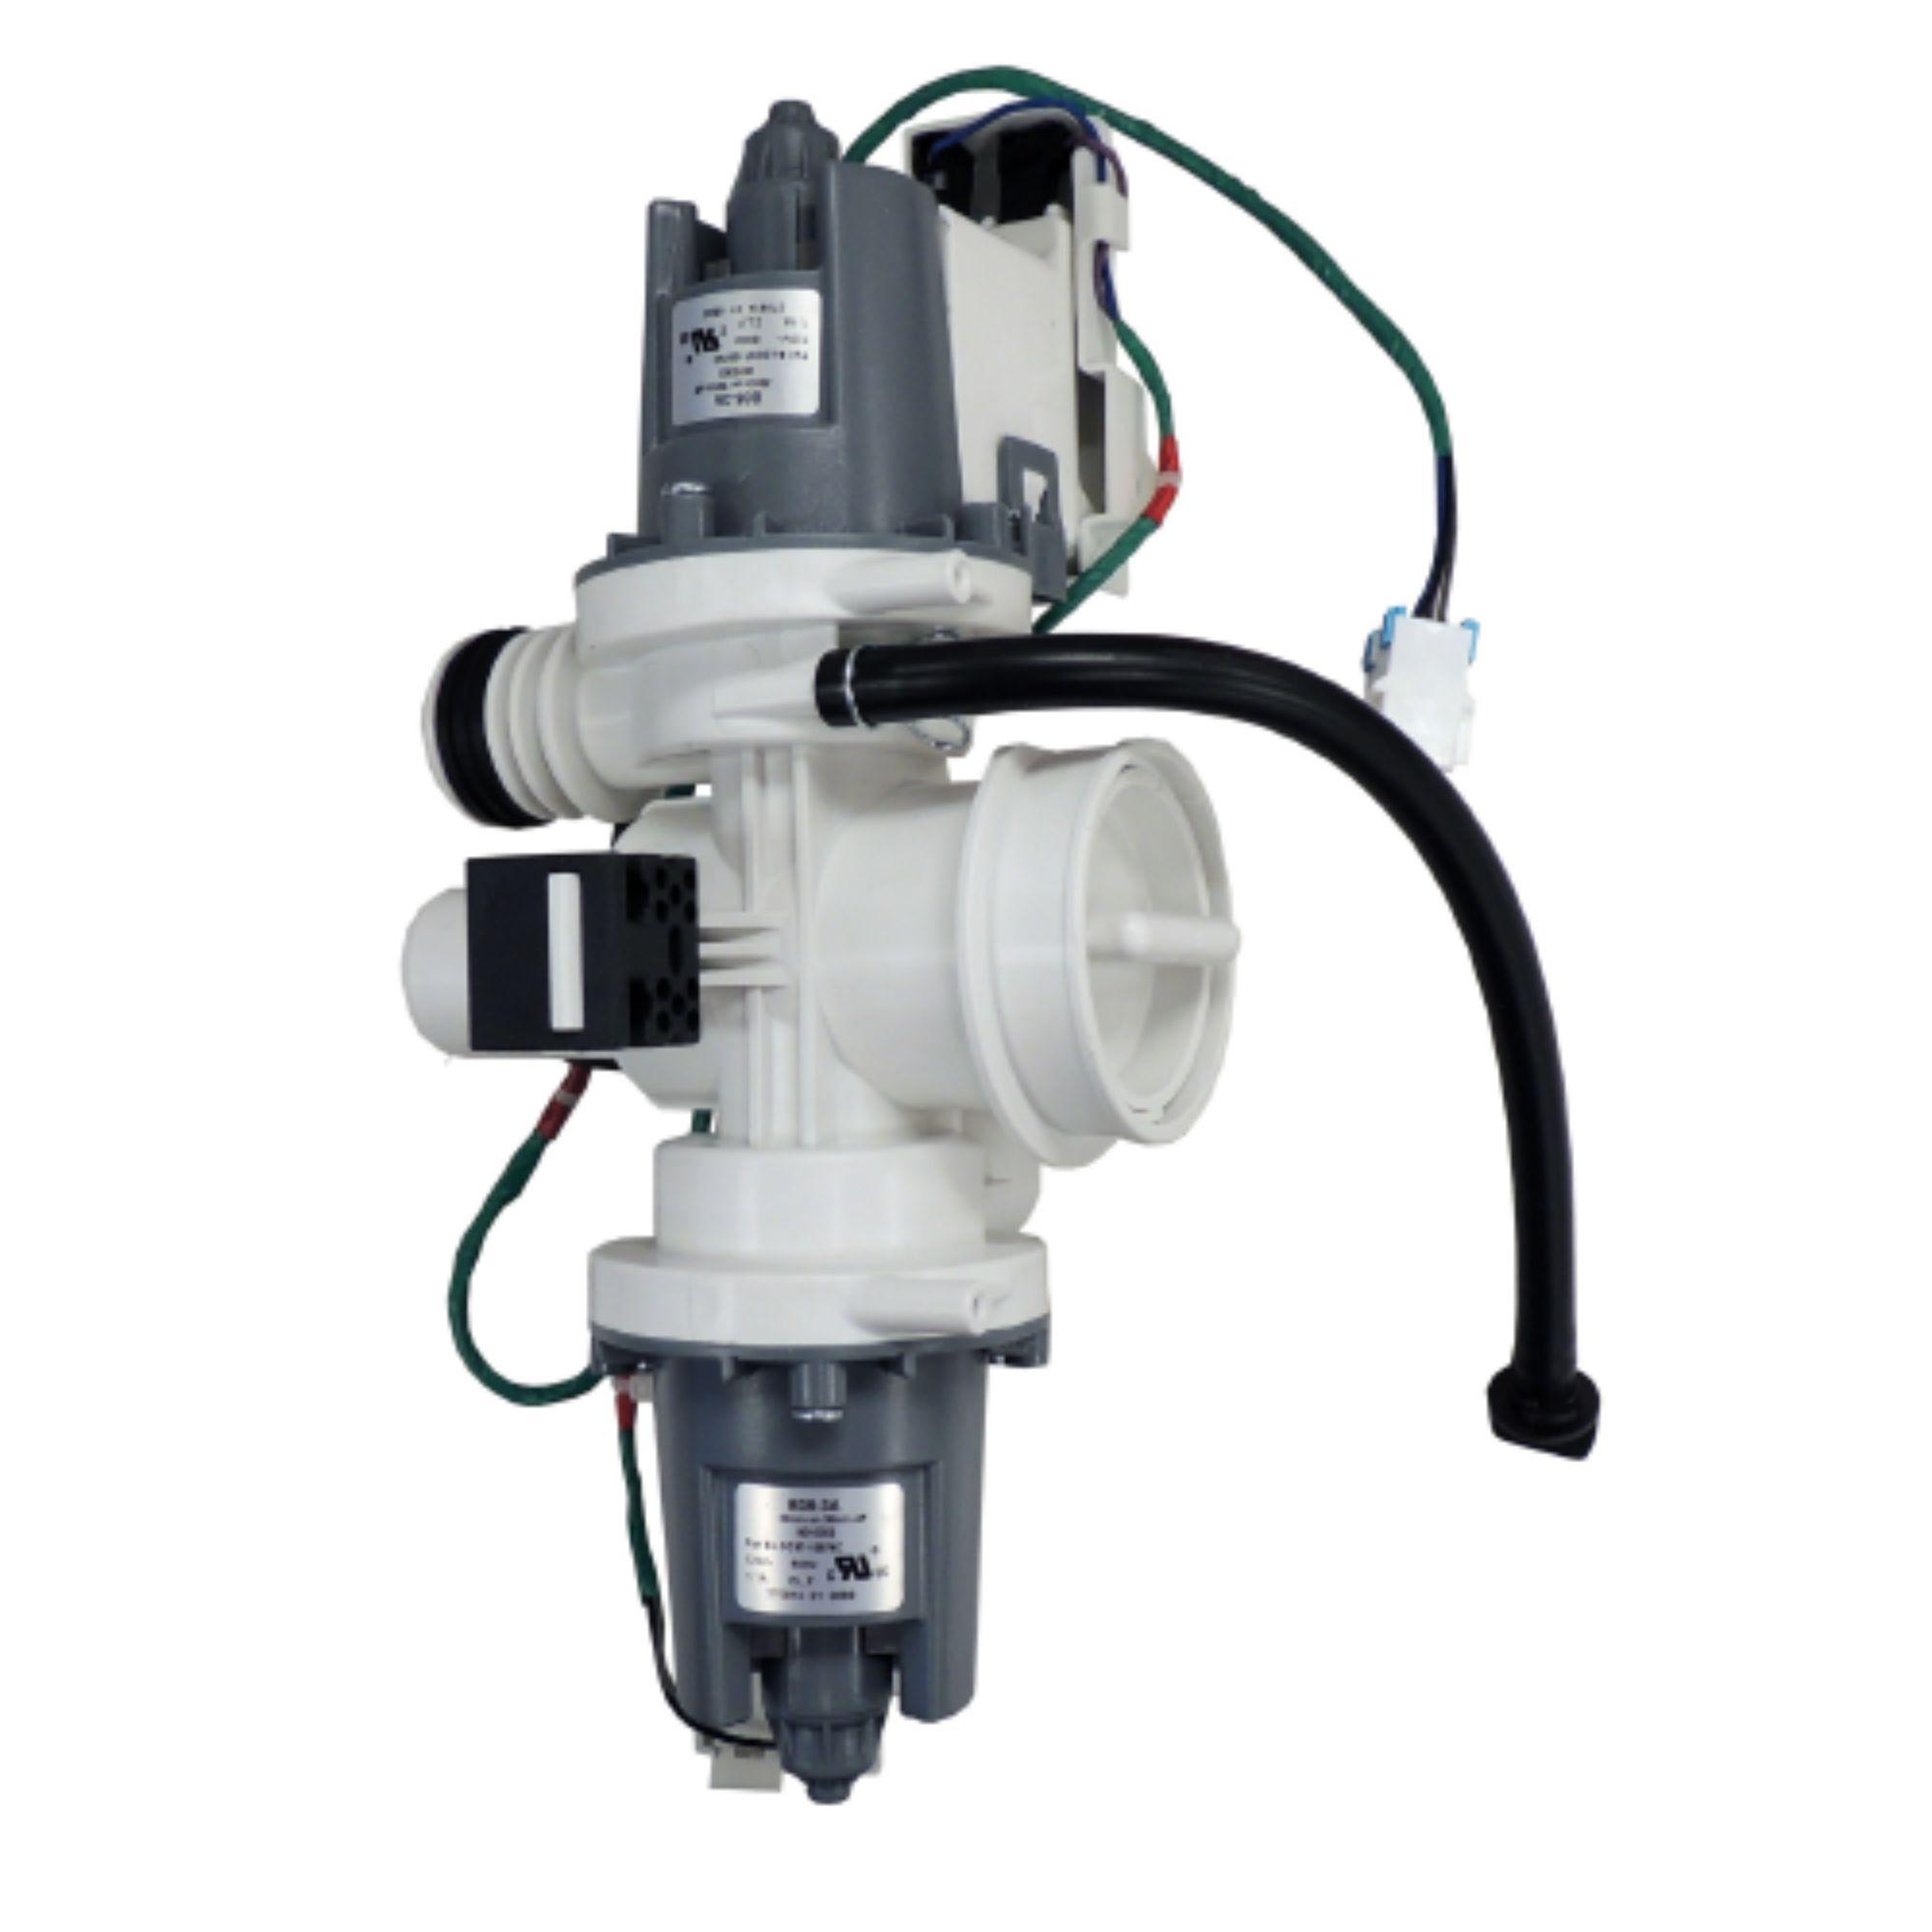 LP5974C For DC97-15974C Samsung Washing Machine Drain Pump ...